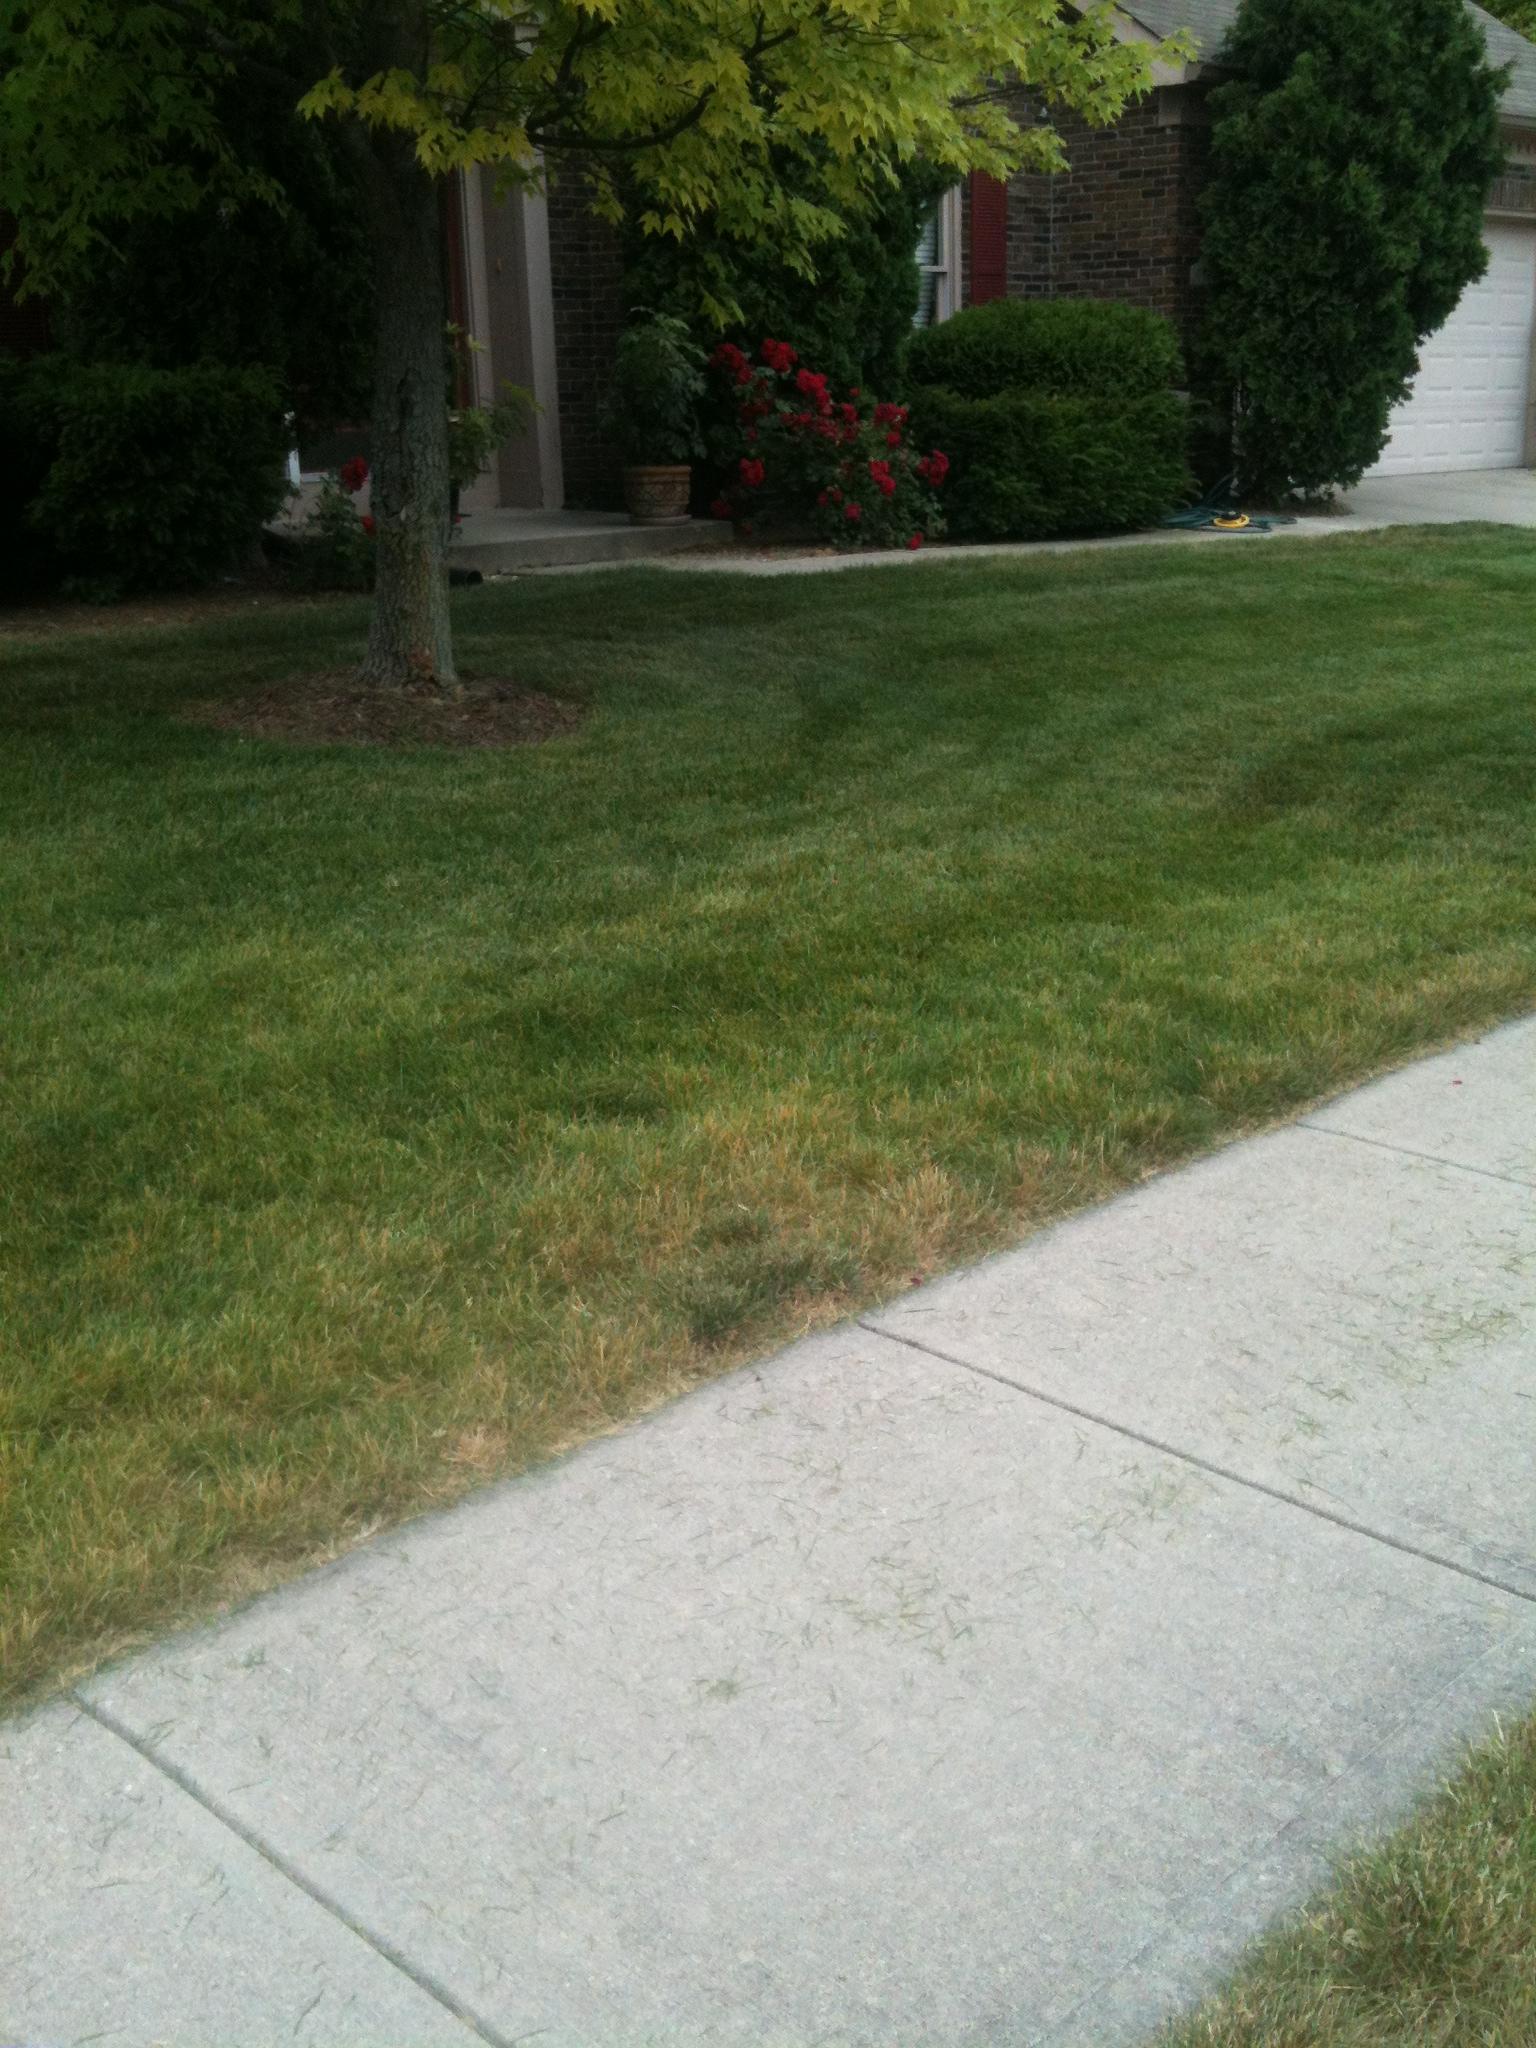 Sidewalk edges